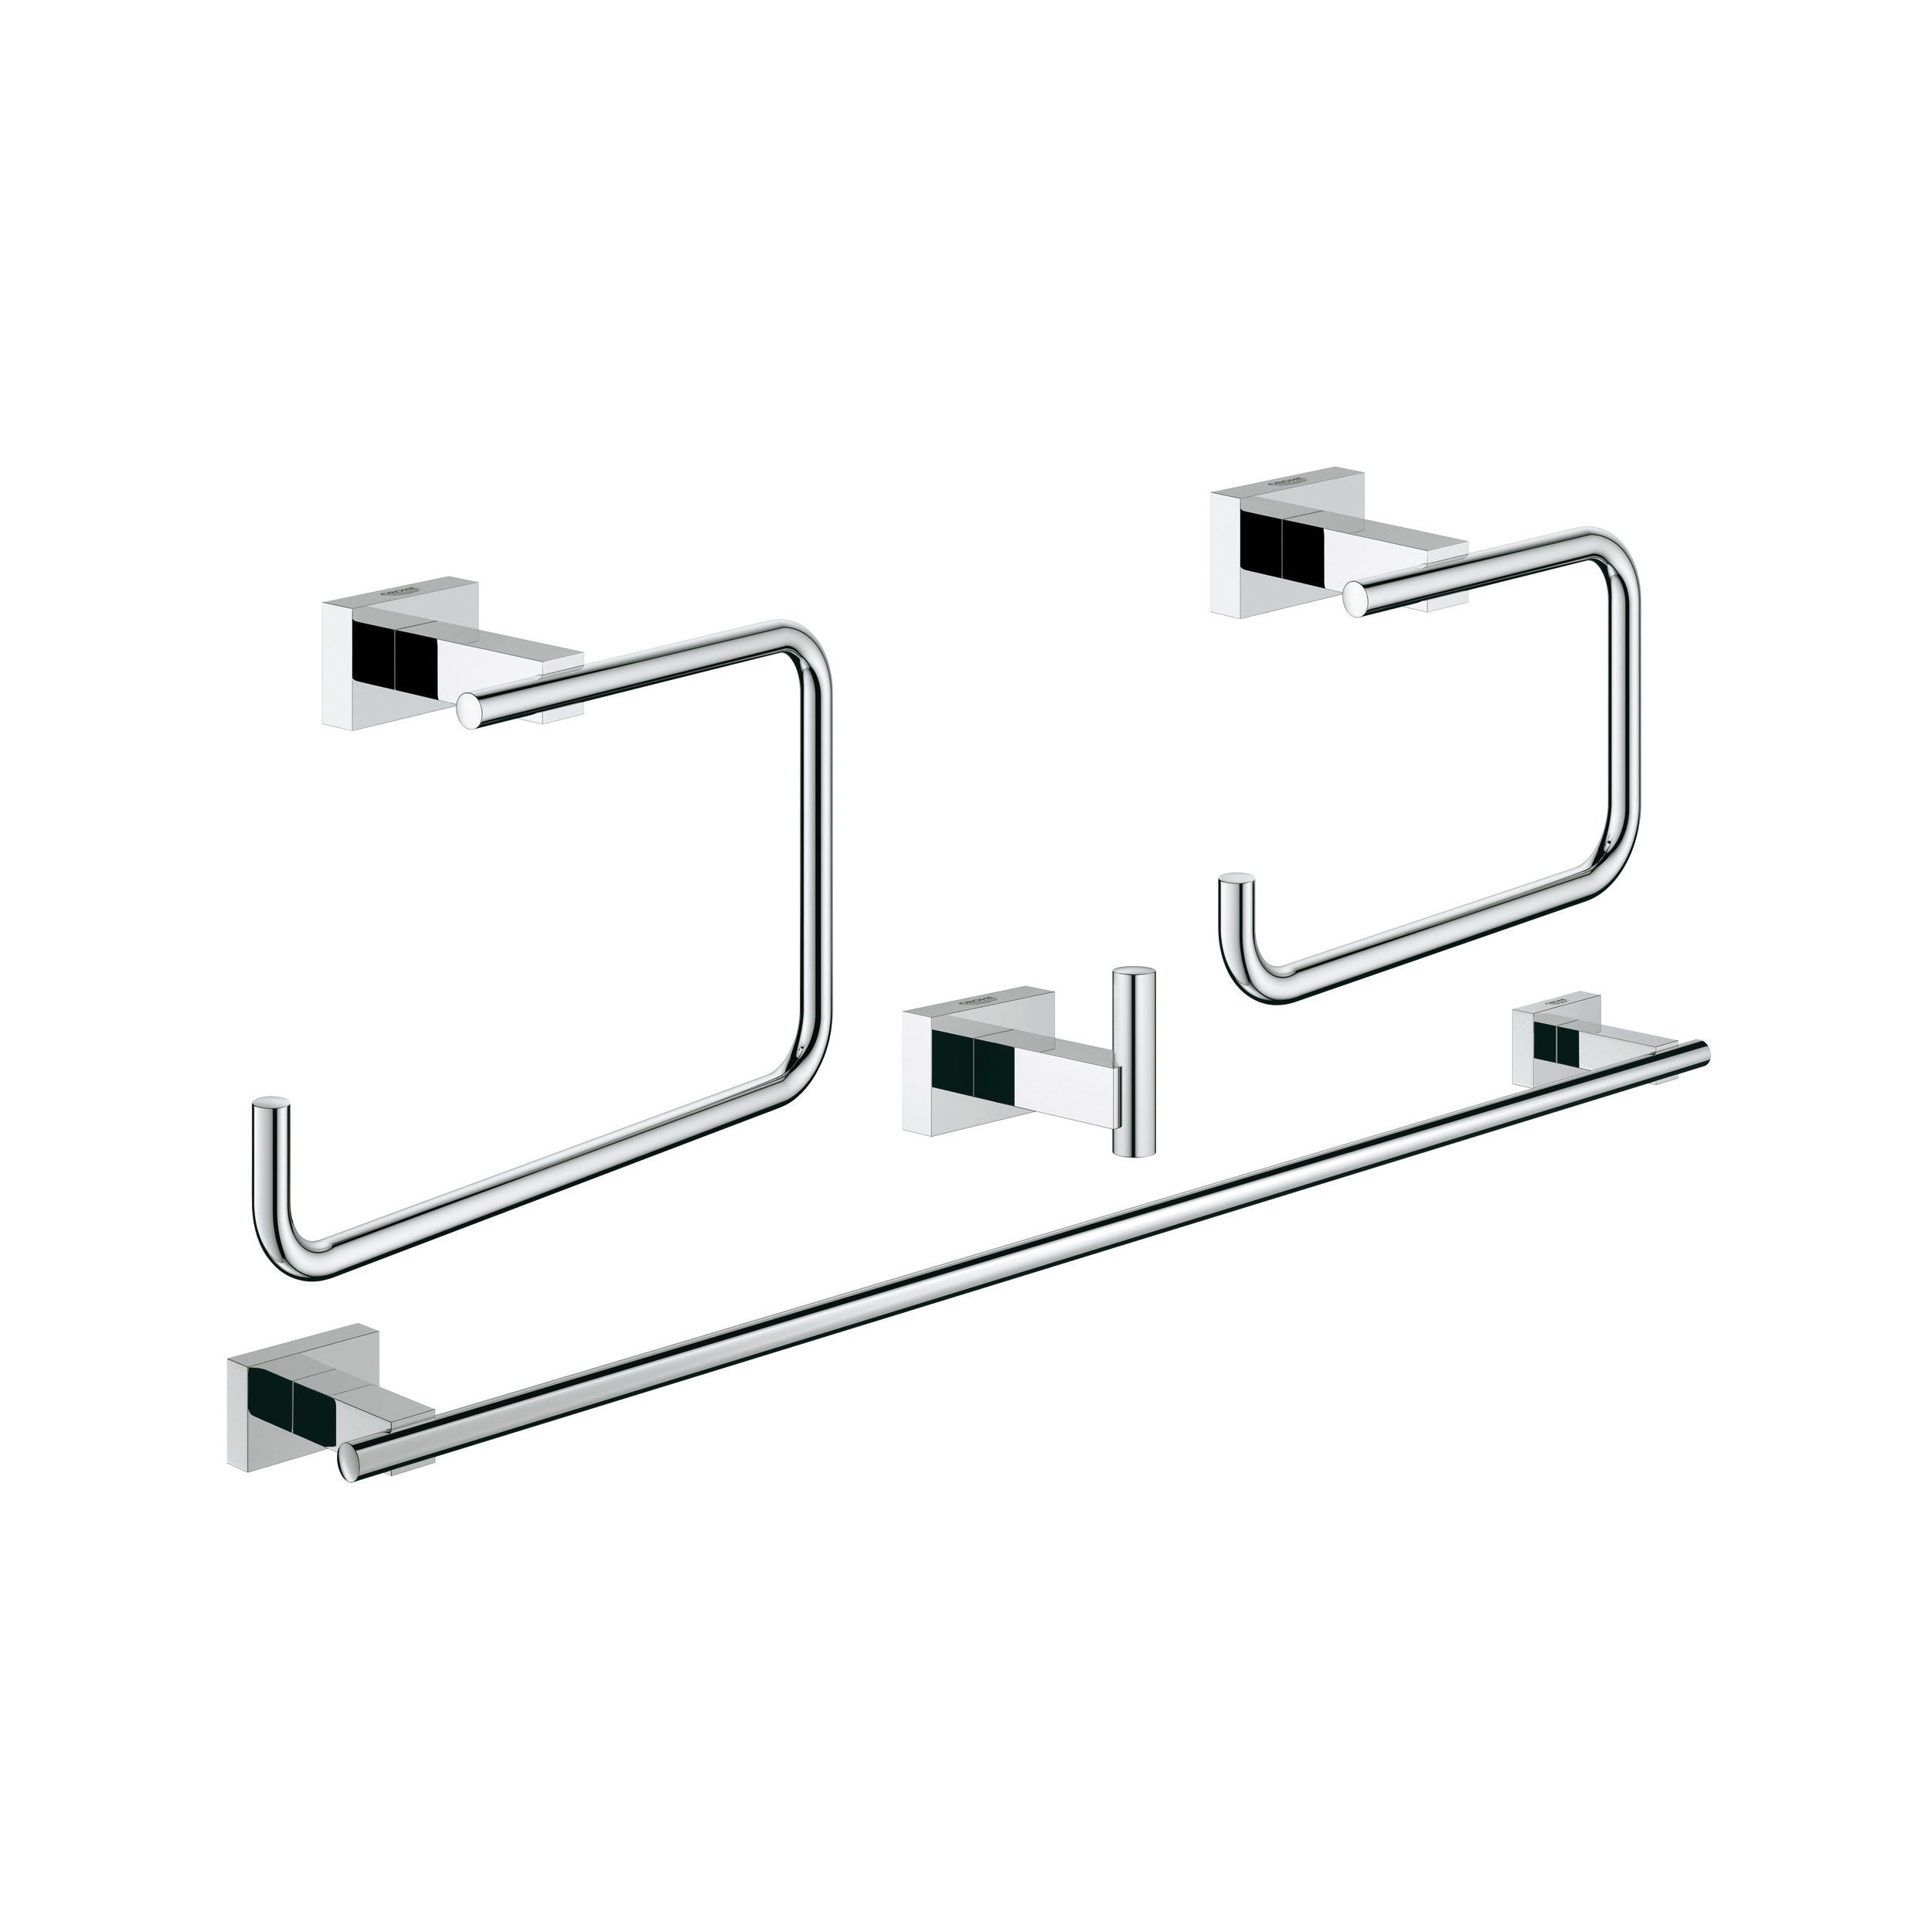 GROHE 40778001 Essentials Cube 4-In-1 Master Bathroom Accessories Set, Metal, Import